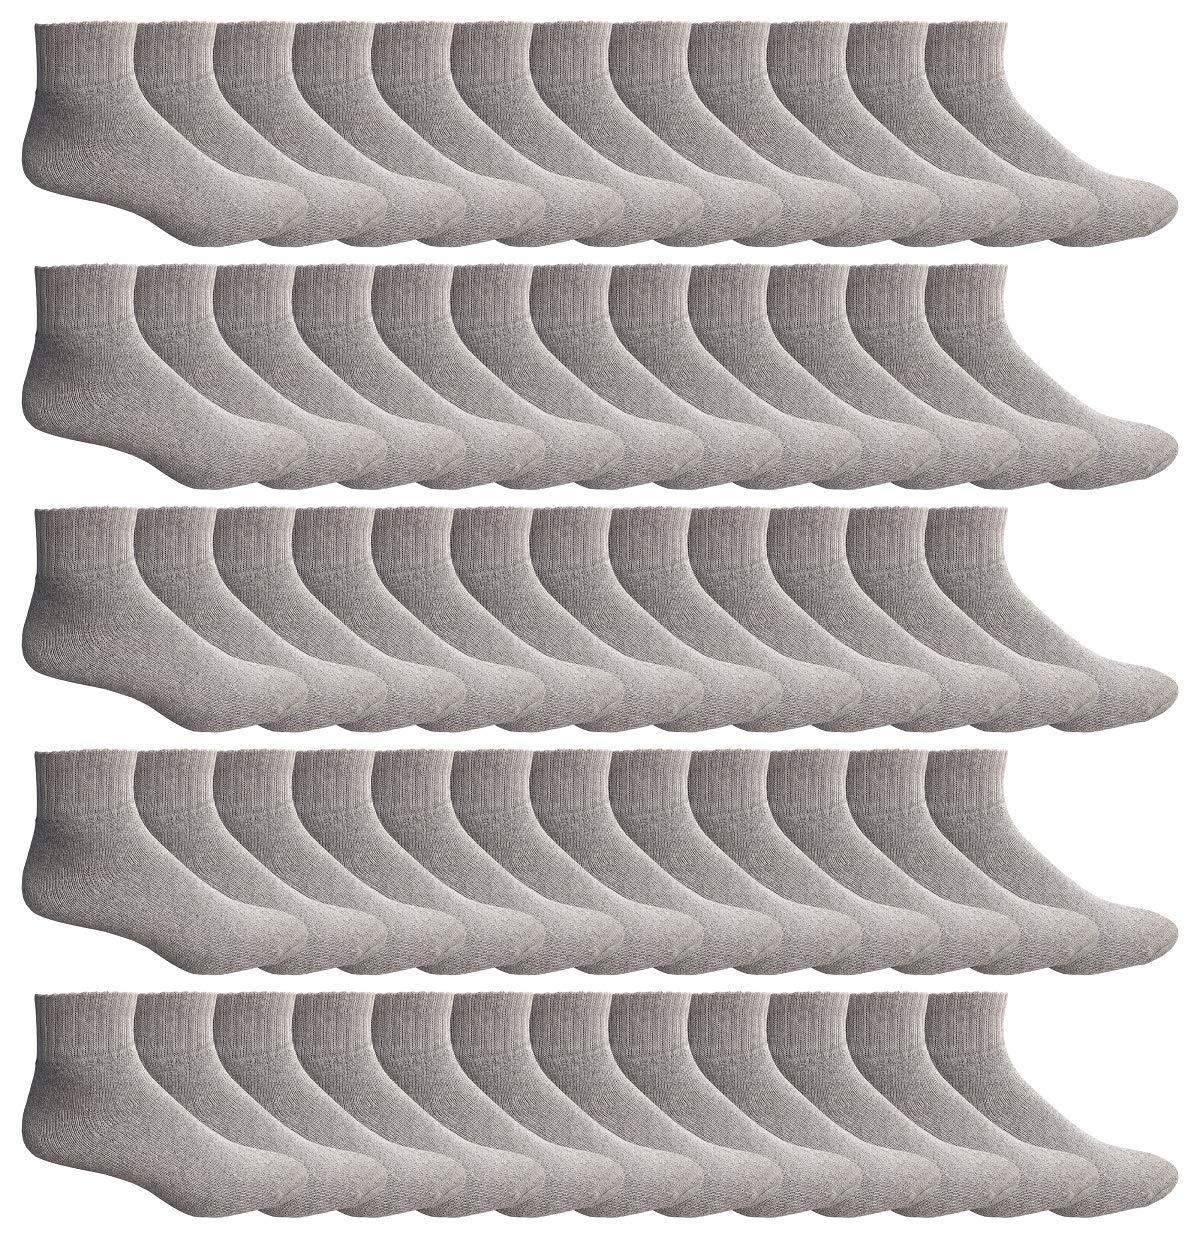 WSD Mens Ankle Socks, Wholesale Bulk Pack Athletic Sports Sock (180 Pairs Gray) by Wholesale Sock Deals (Image #1)